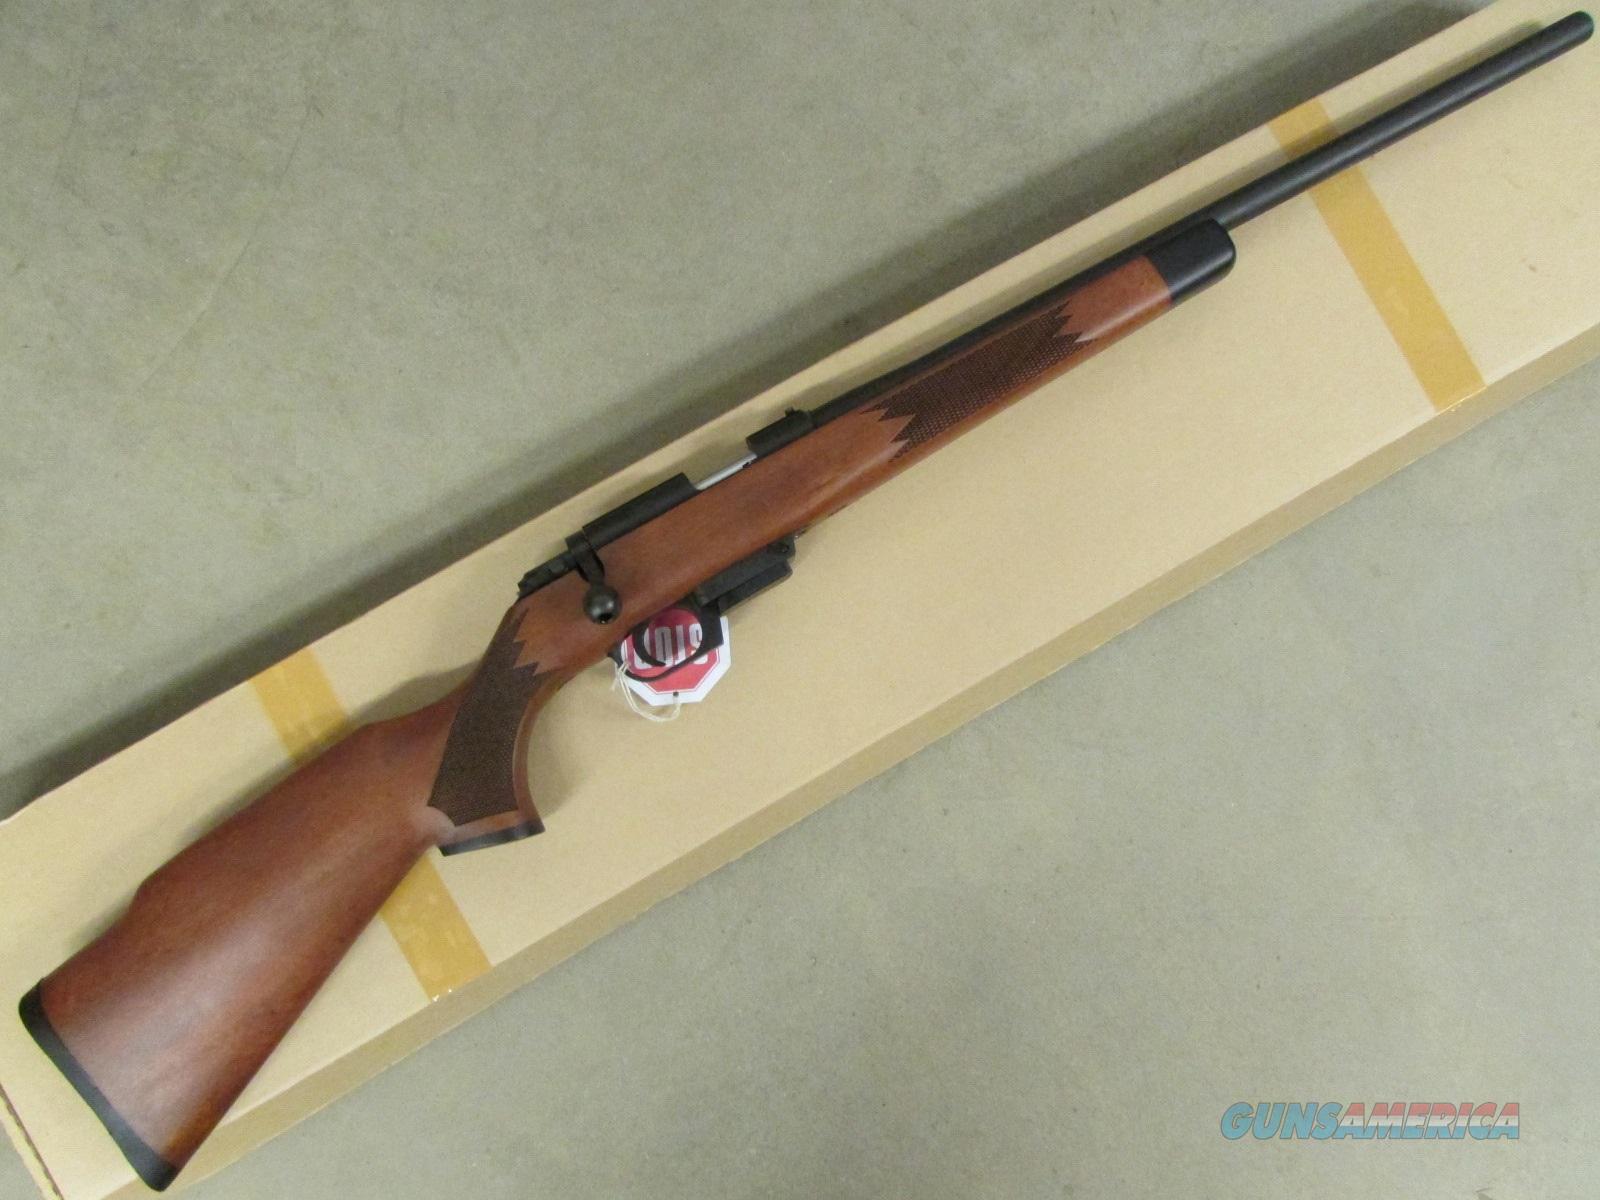 I Veien For En Drm Januar 2016 Littelfuse Mini Addacircuit Product Details Pep Boys 22 Cal Bolt Action Rifles Sale